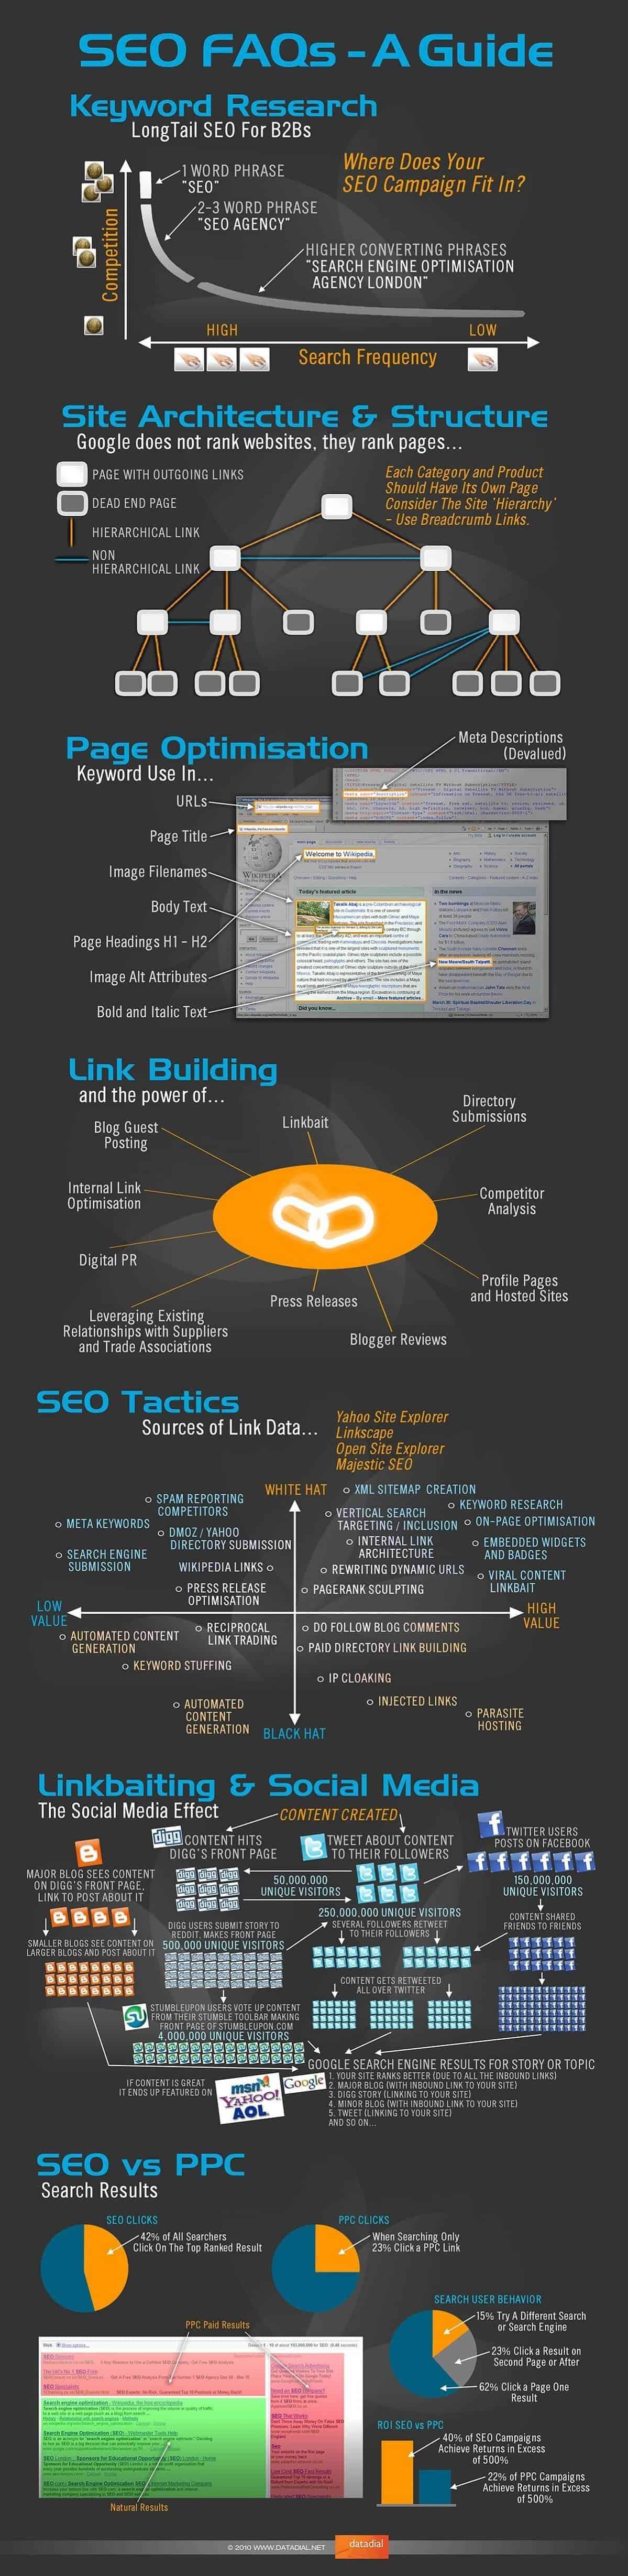 seo-link-building-faq-infographic